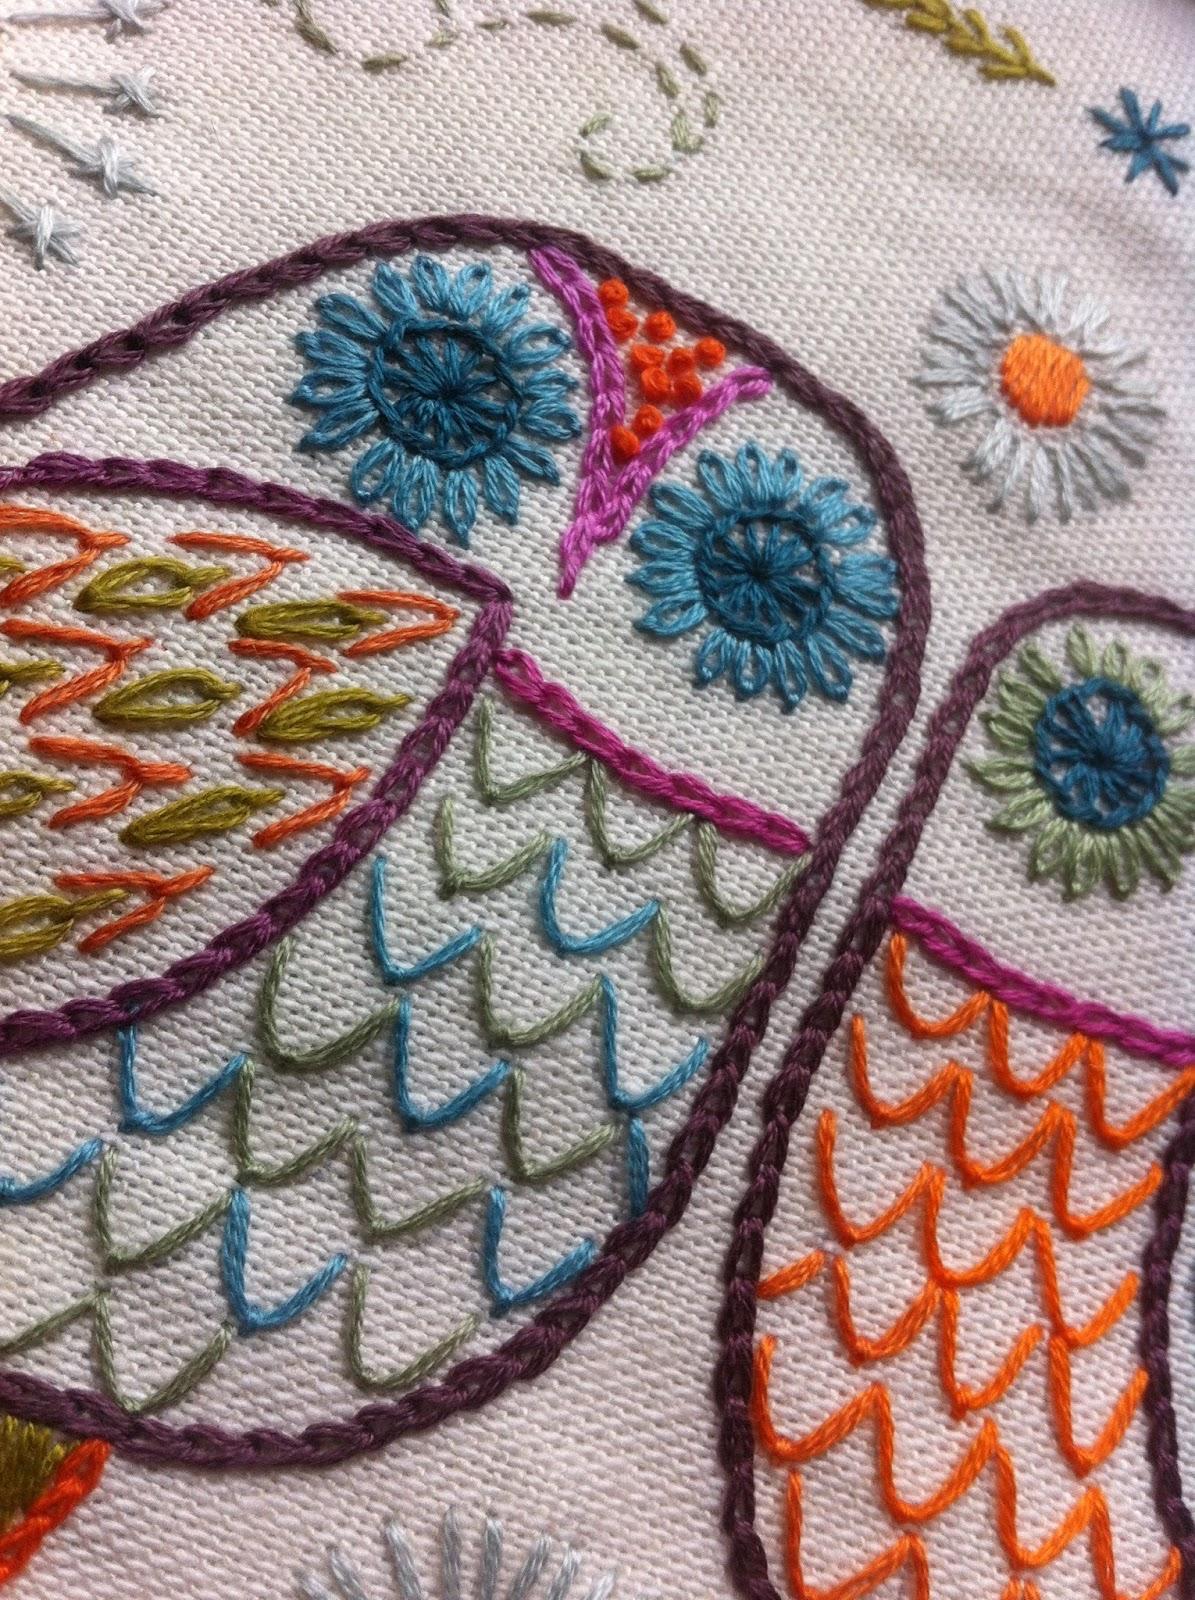 Nancy nicholson new owl download